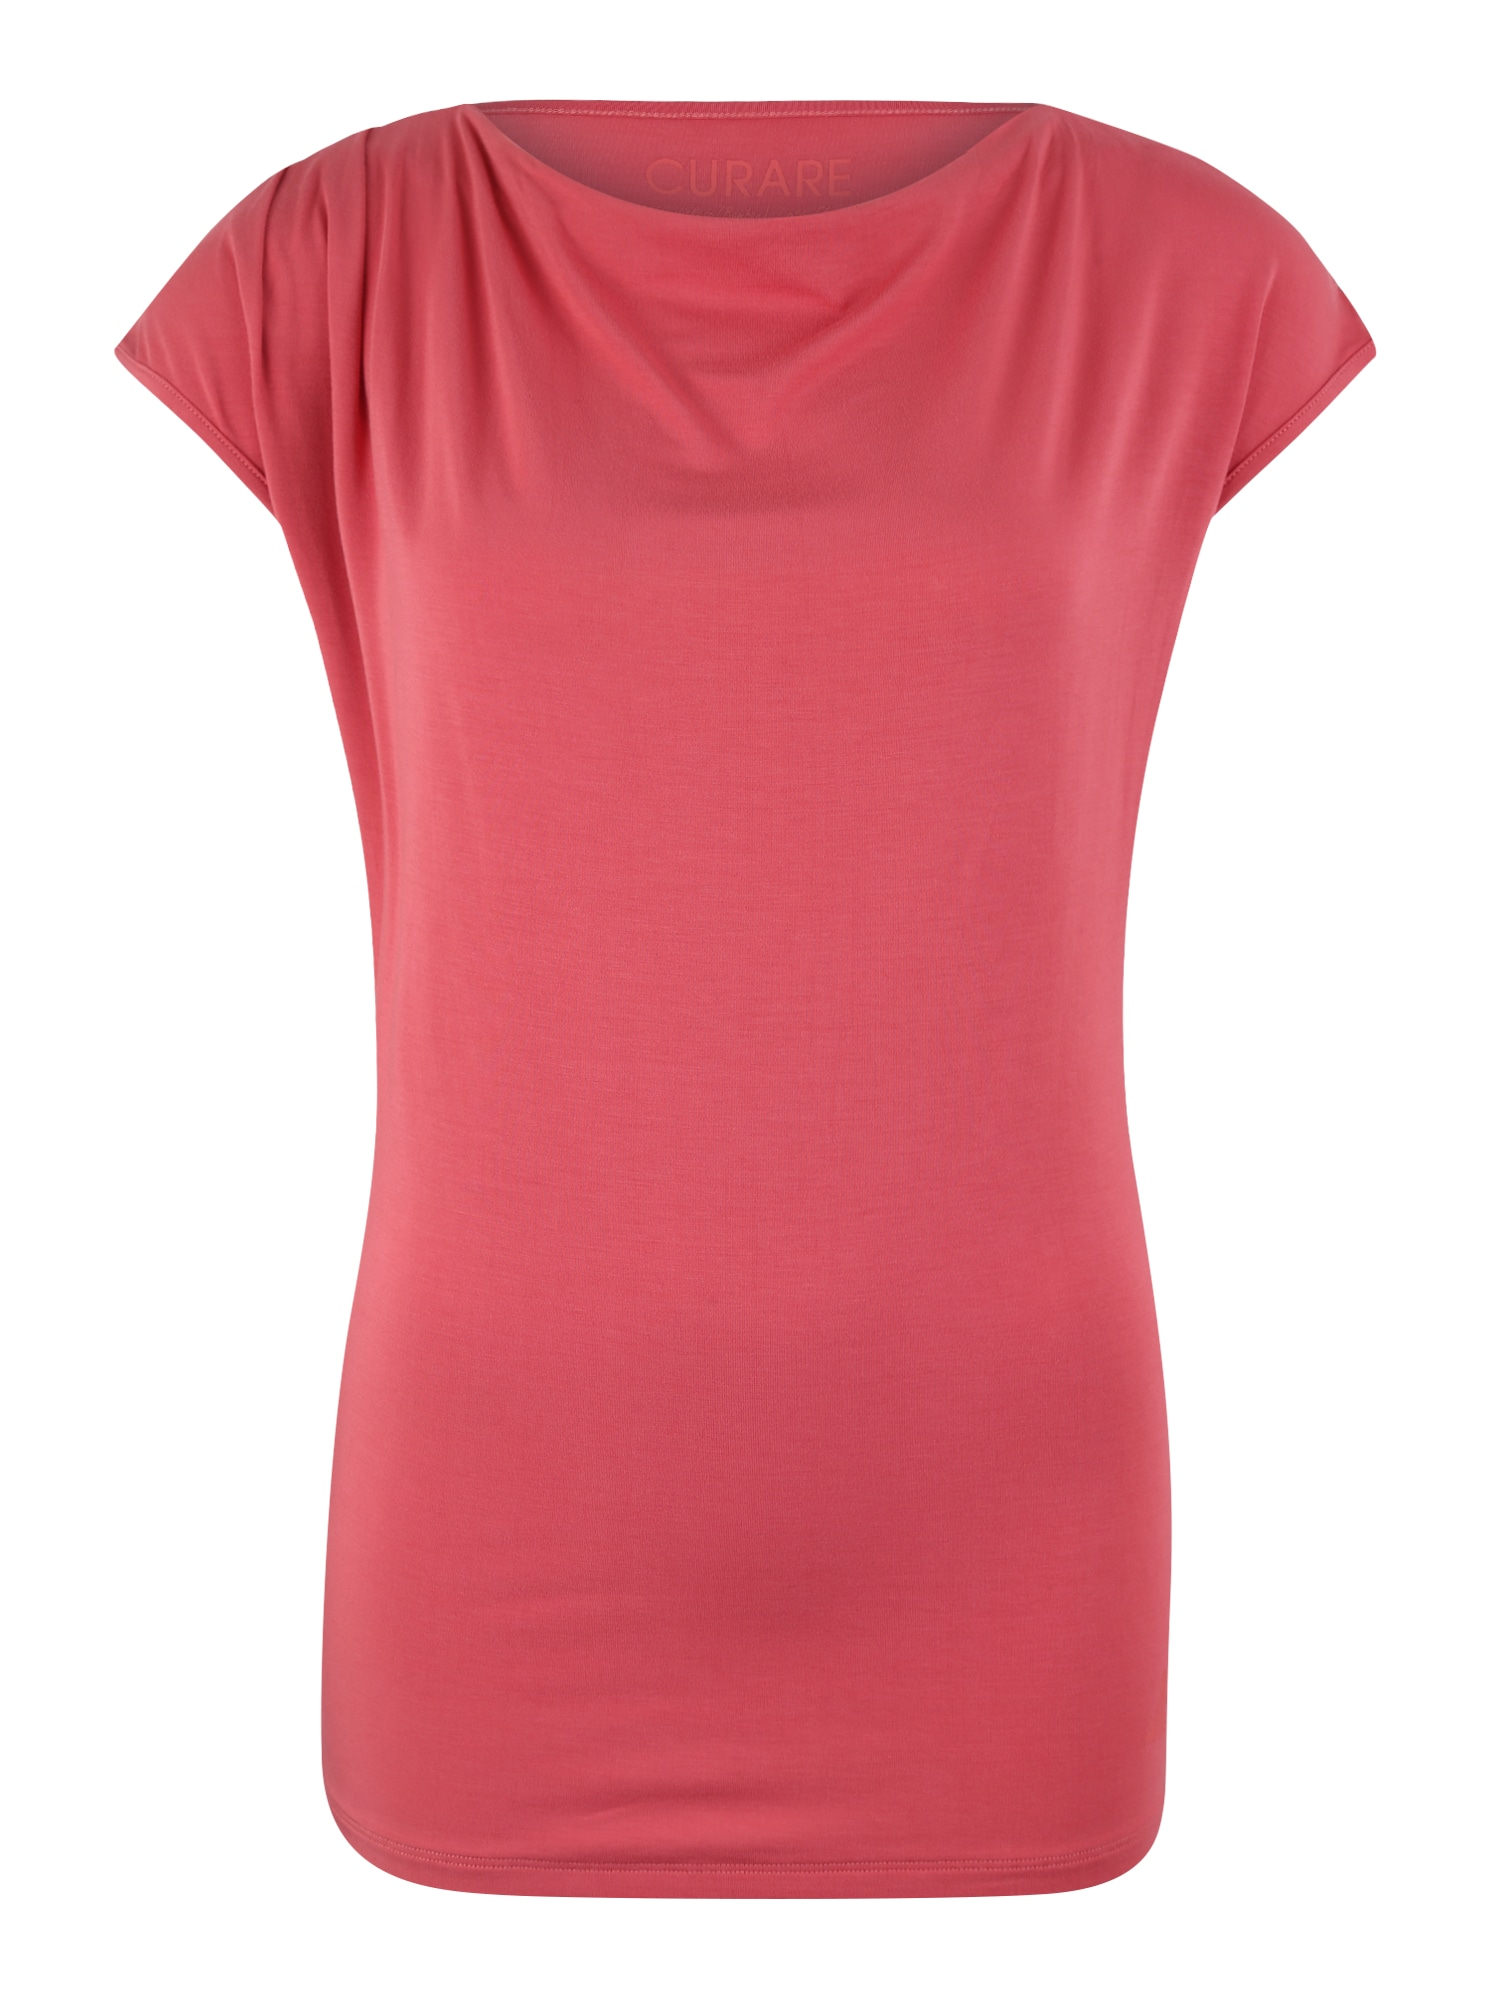 Funkční tričko top wasserfall melounová CURARE Yogawear